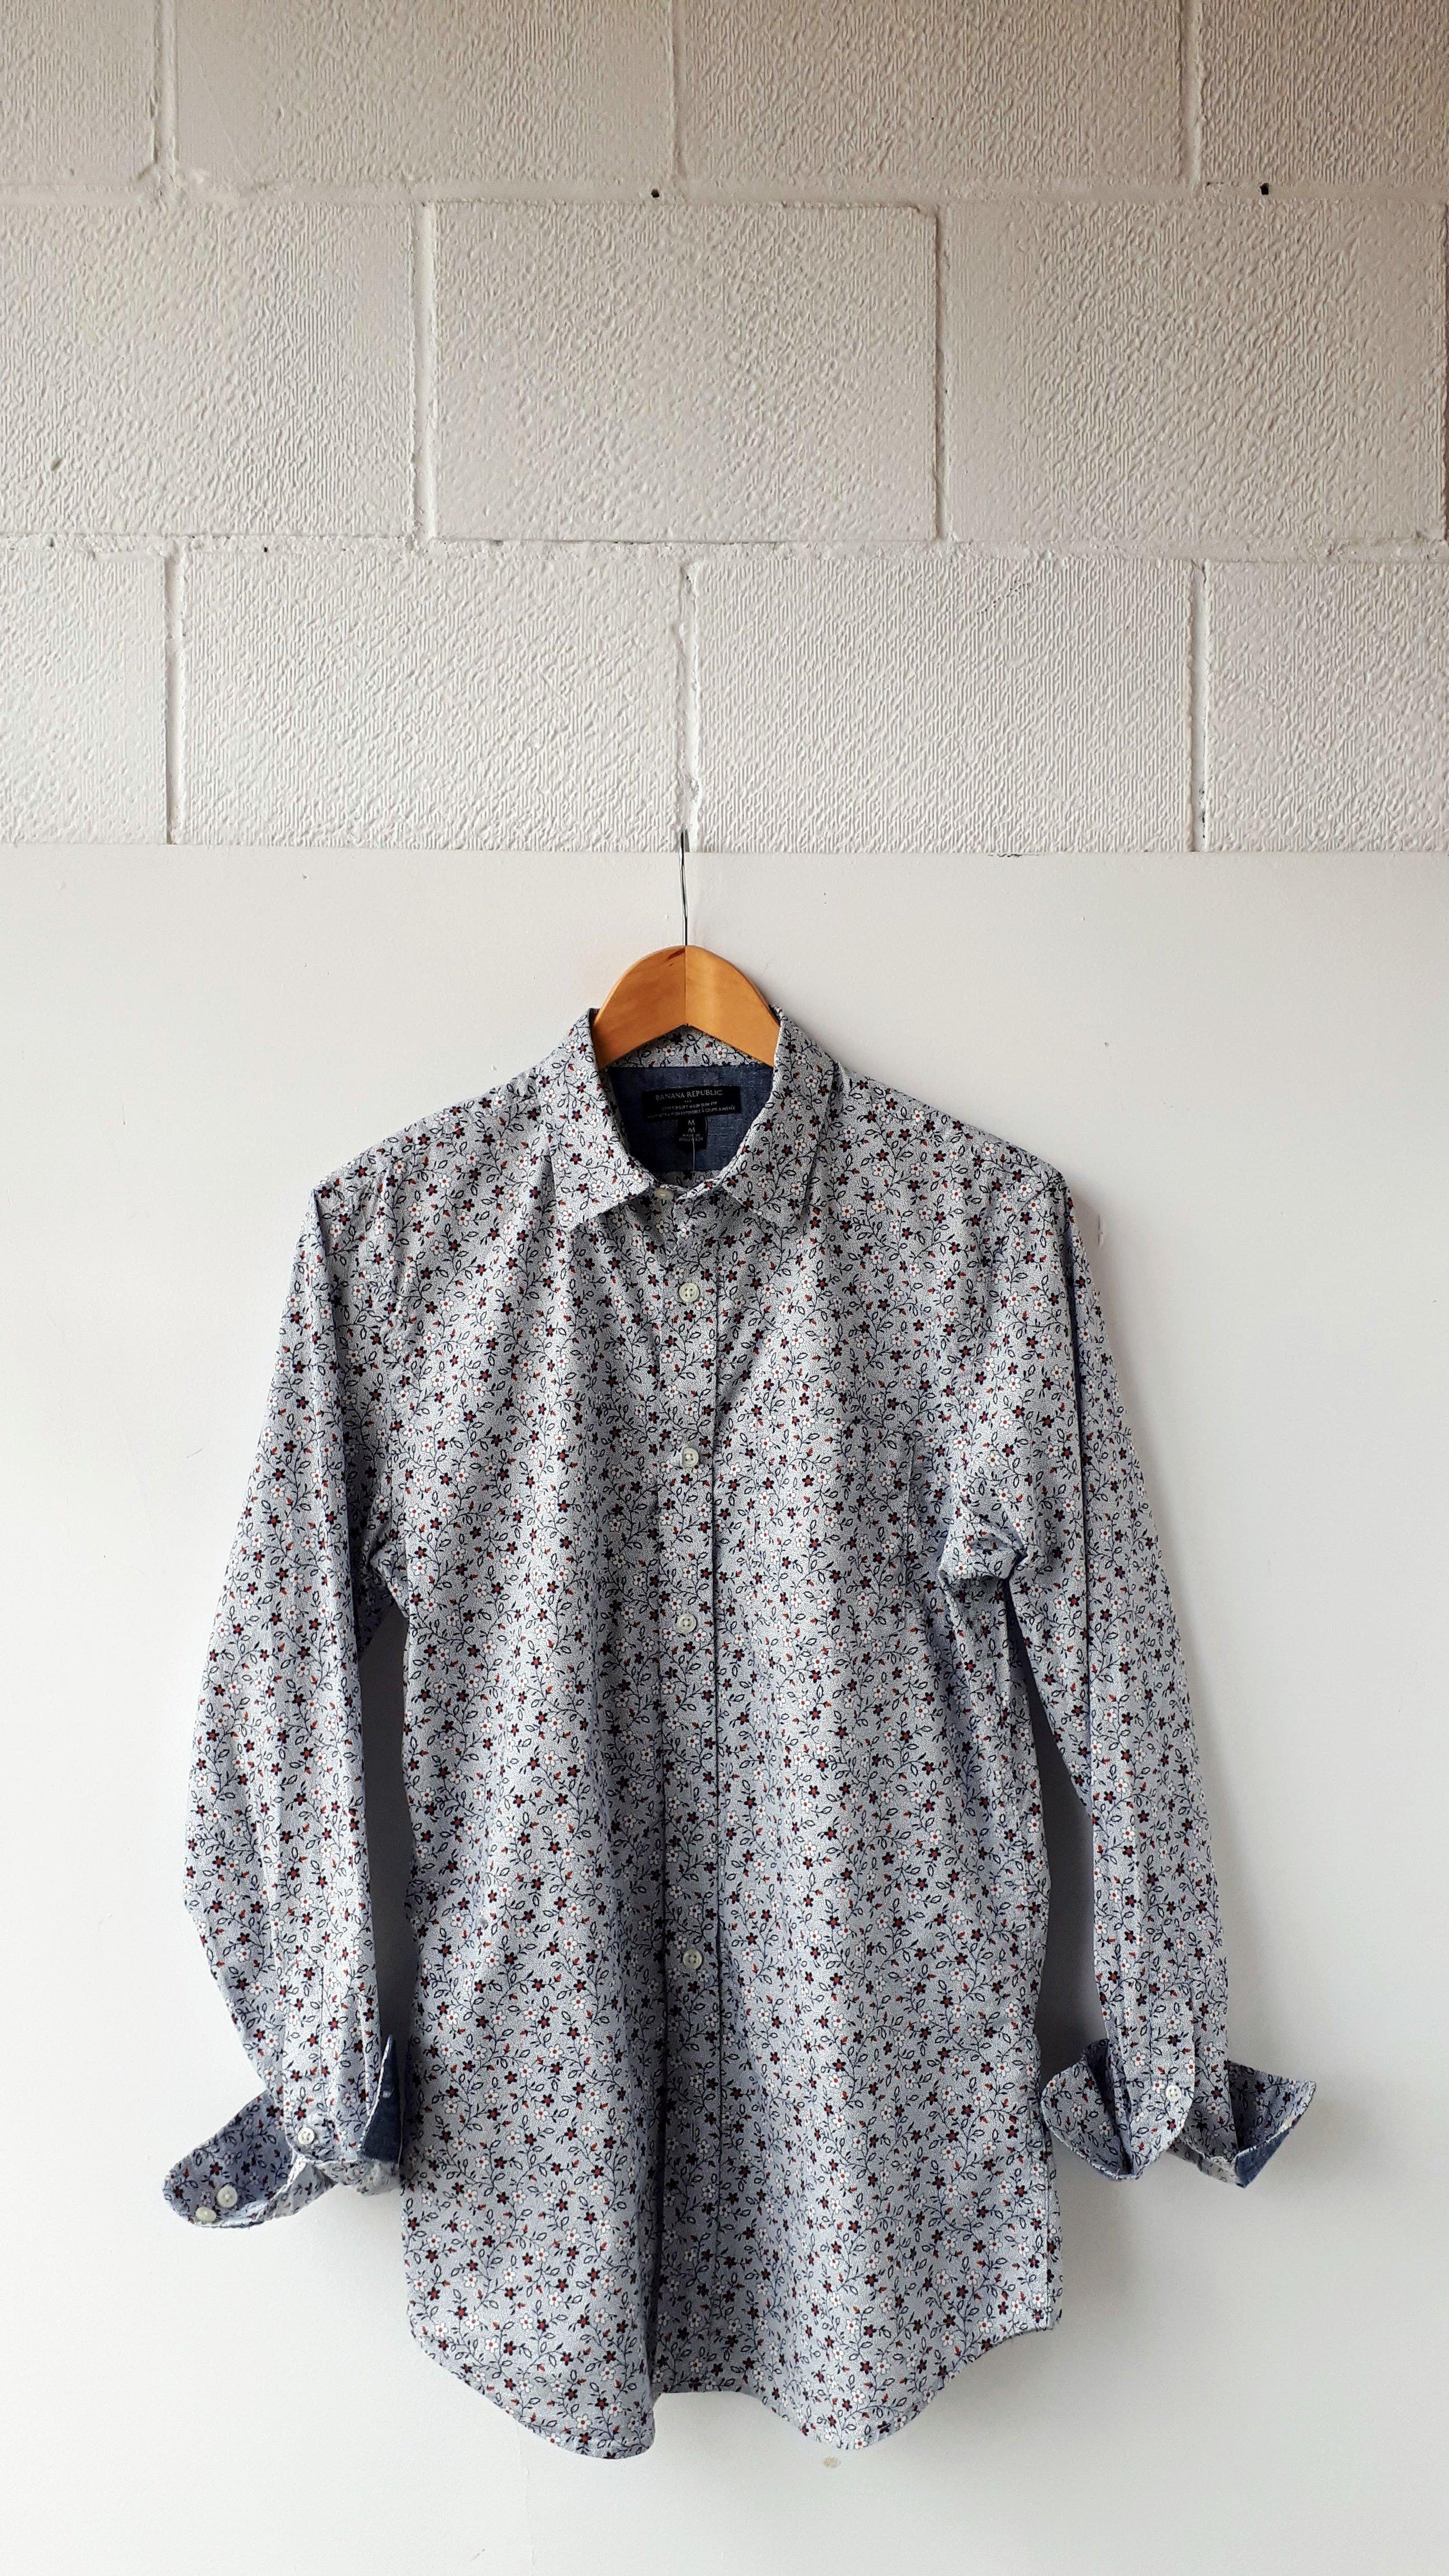 Banana Republic shirt; Men's size M, $24